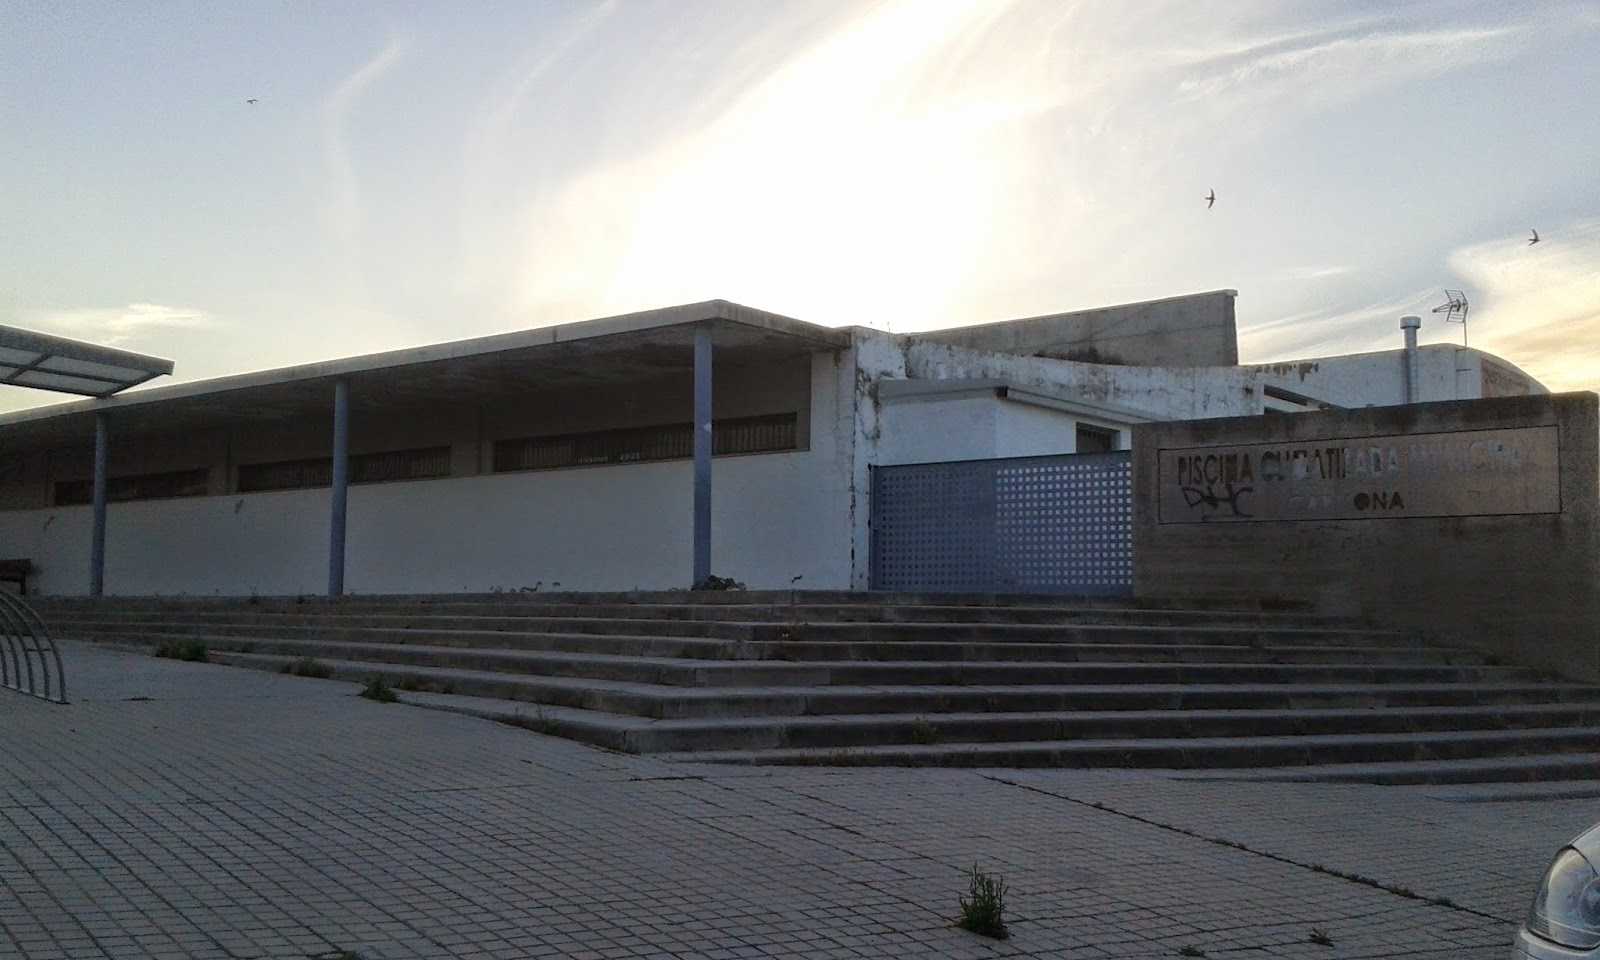 Socialistas de carmona el psoe insta a juan vila a for Piscina municipal avila